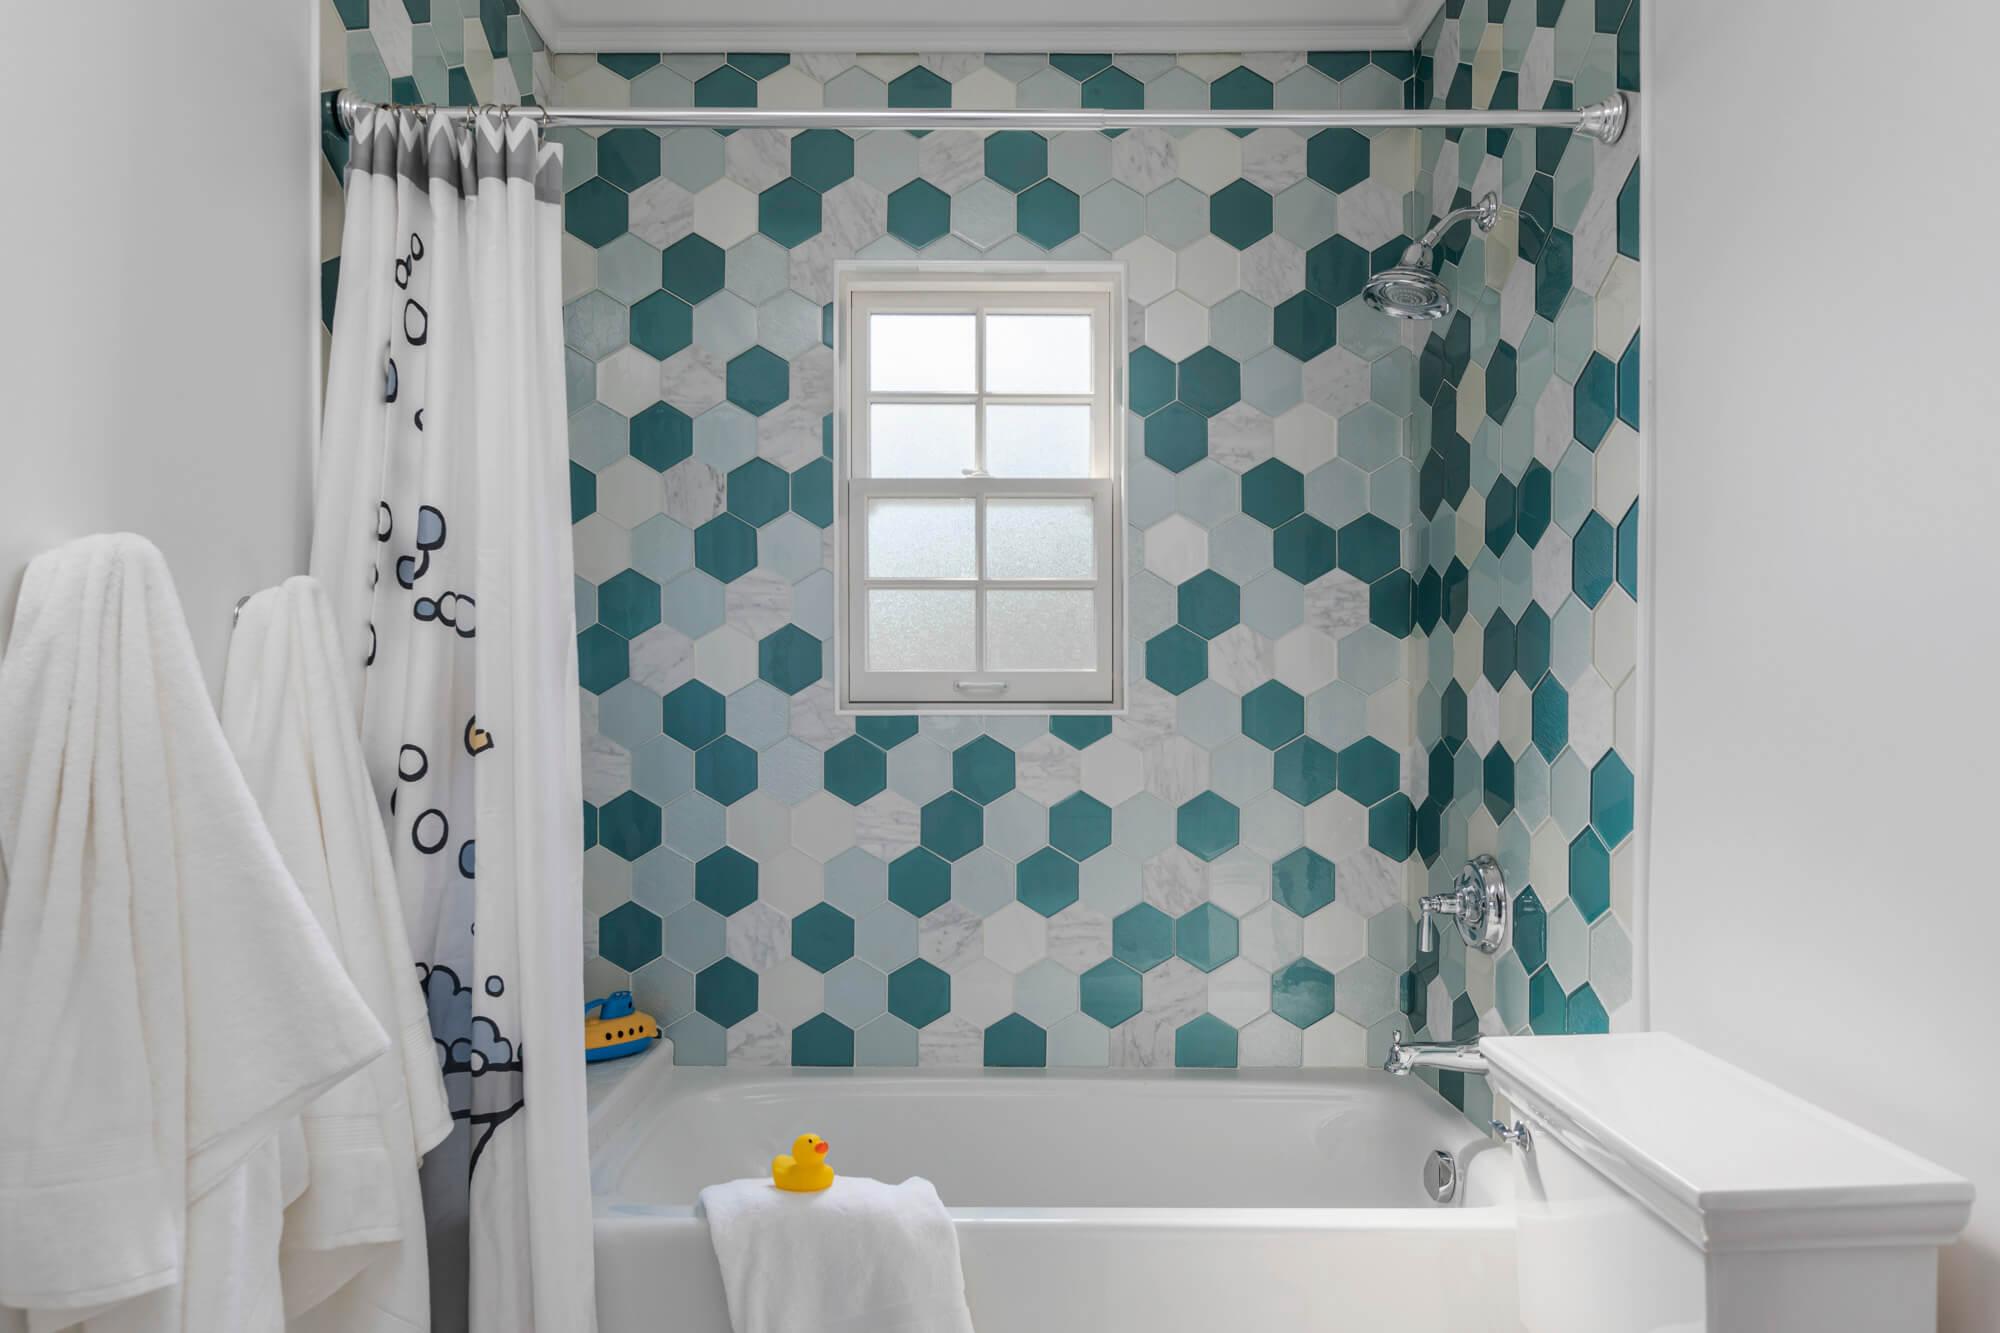 Bathroom-Remodeling-in-Orange-County